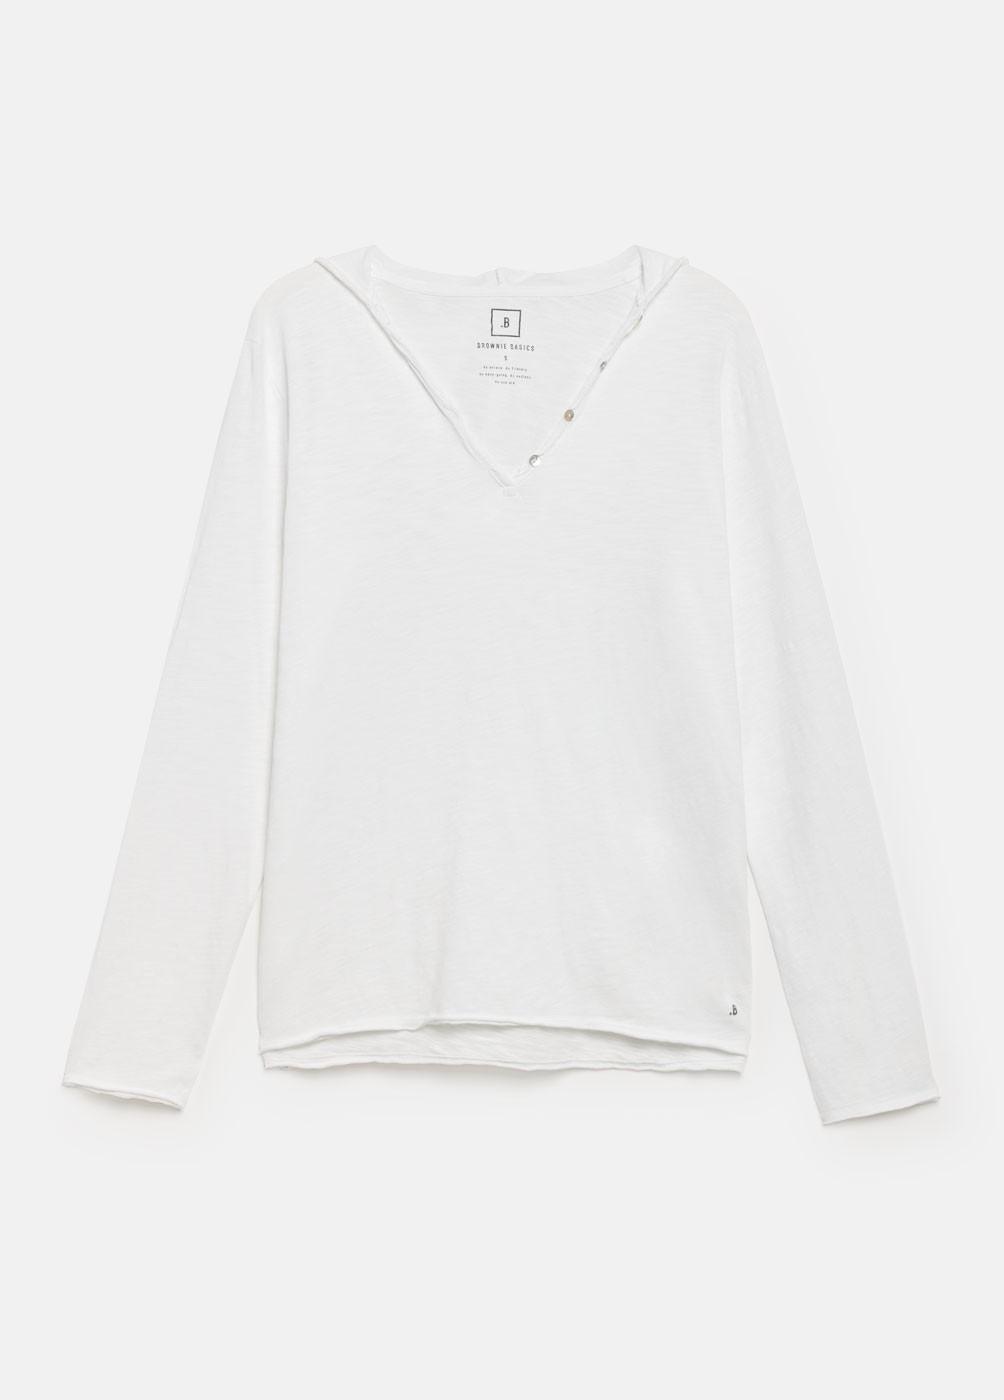 Hoodie long sleeve basic t-shirt